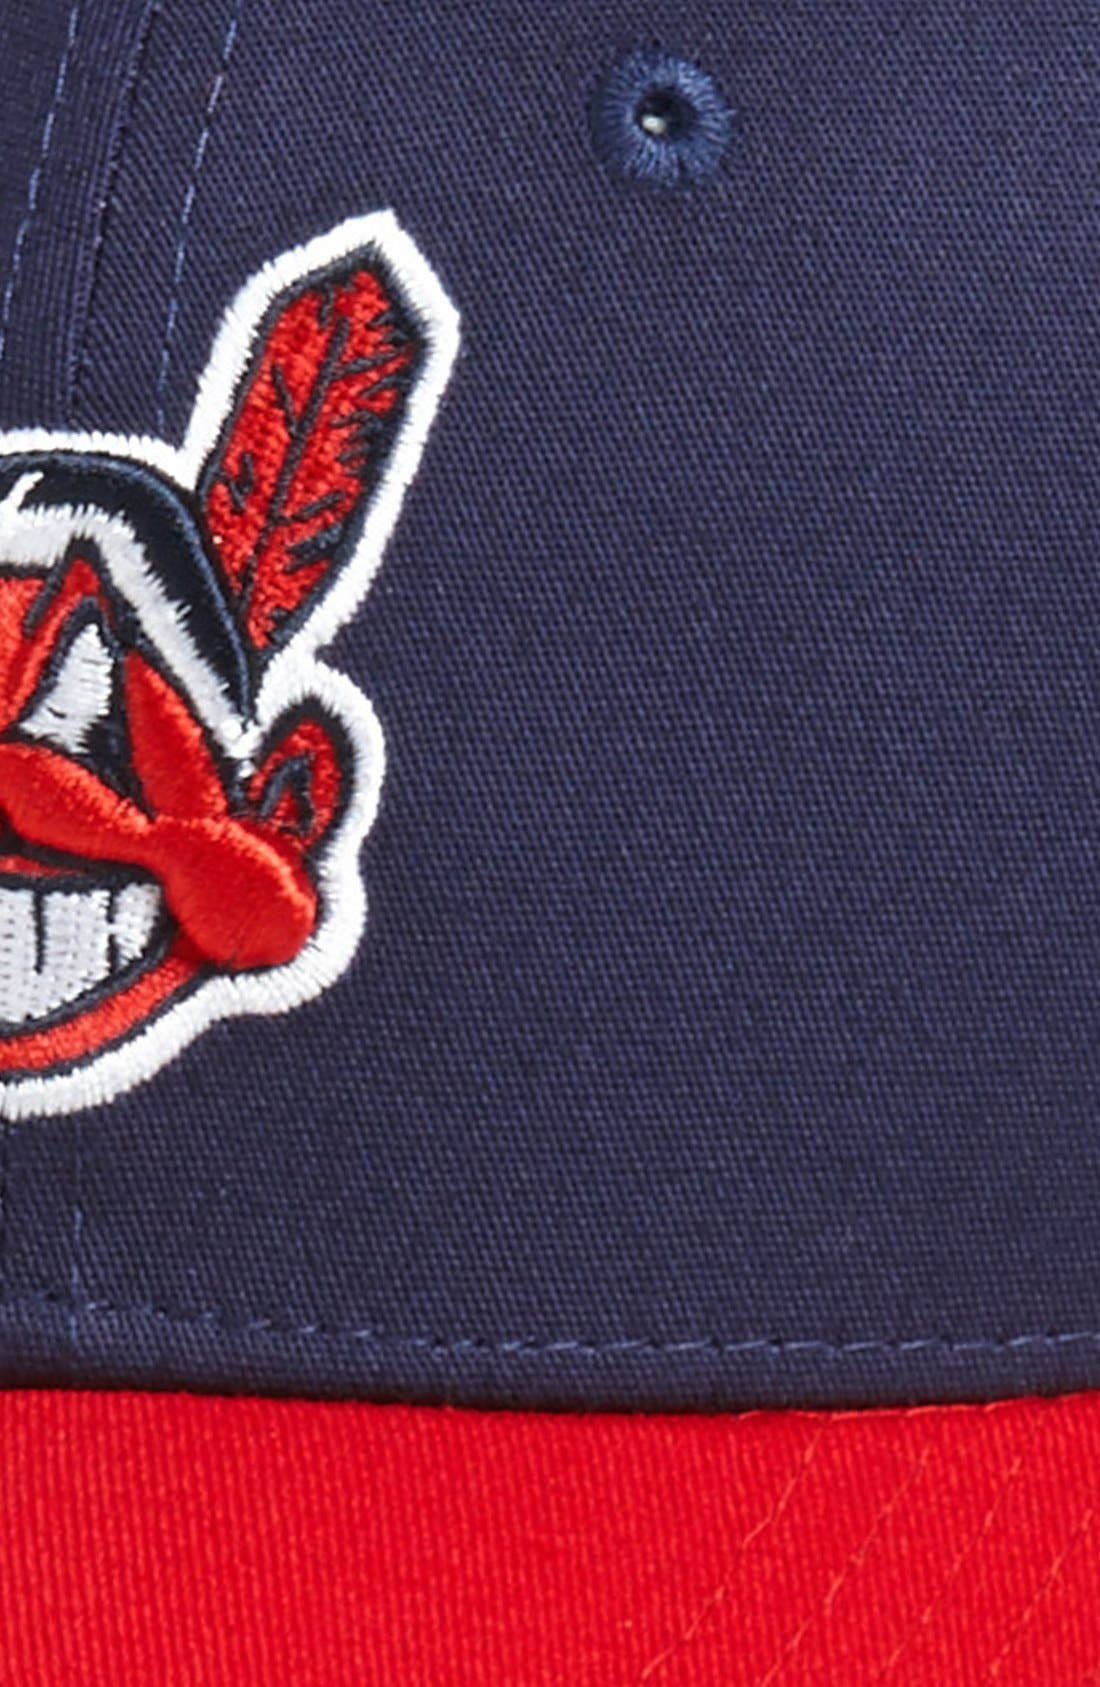 Alternate Image 2  - New Era Cap 'Cleveland Indians - Tie Breaker' Baseball Cap (Big Boys)